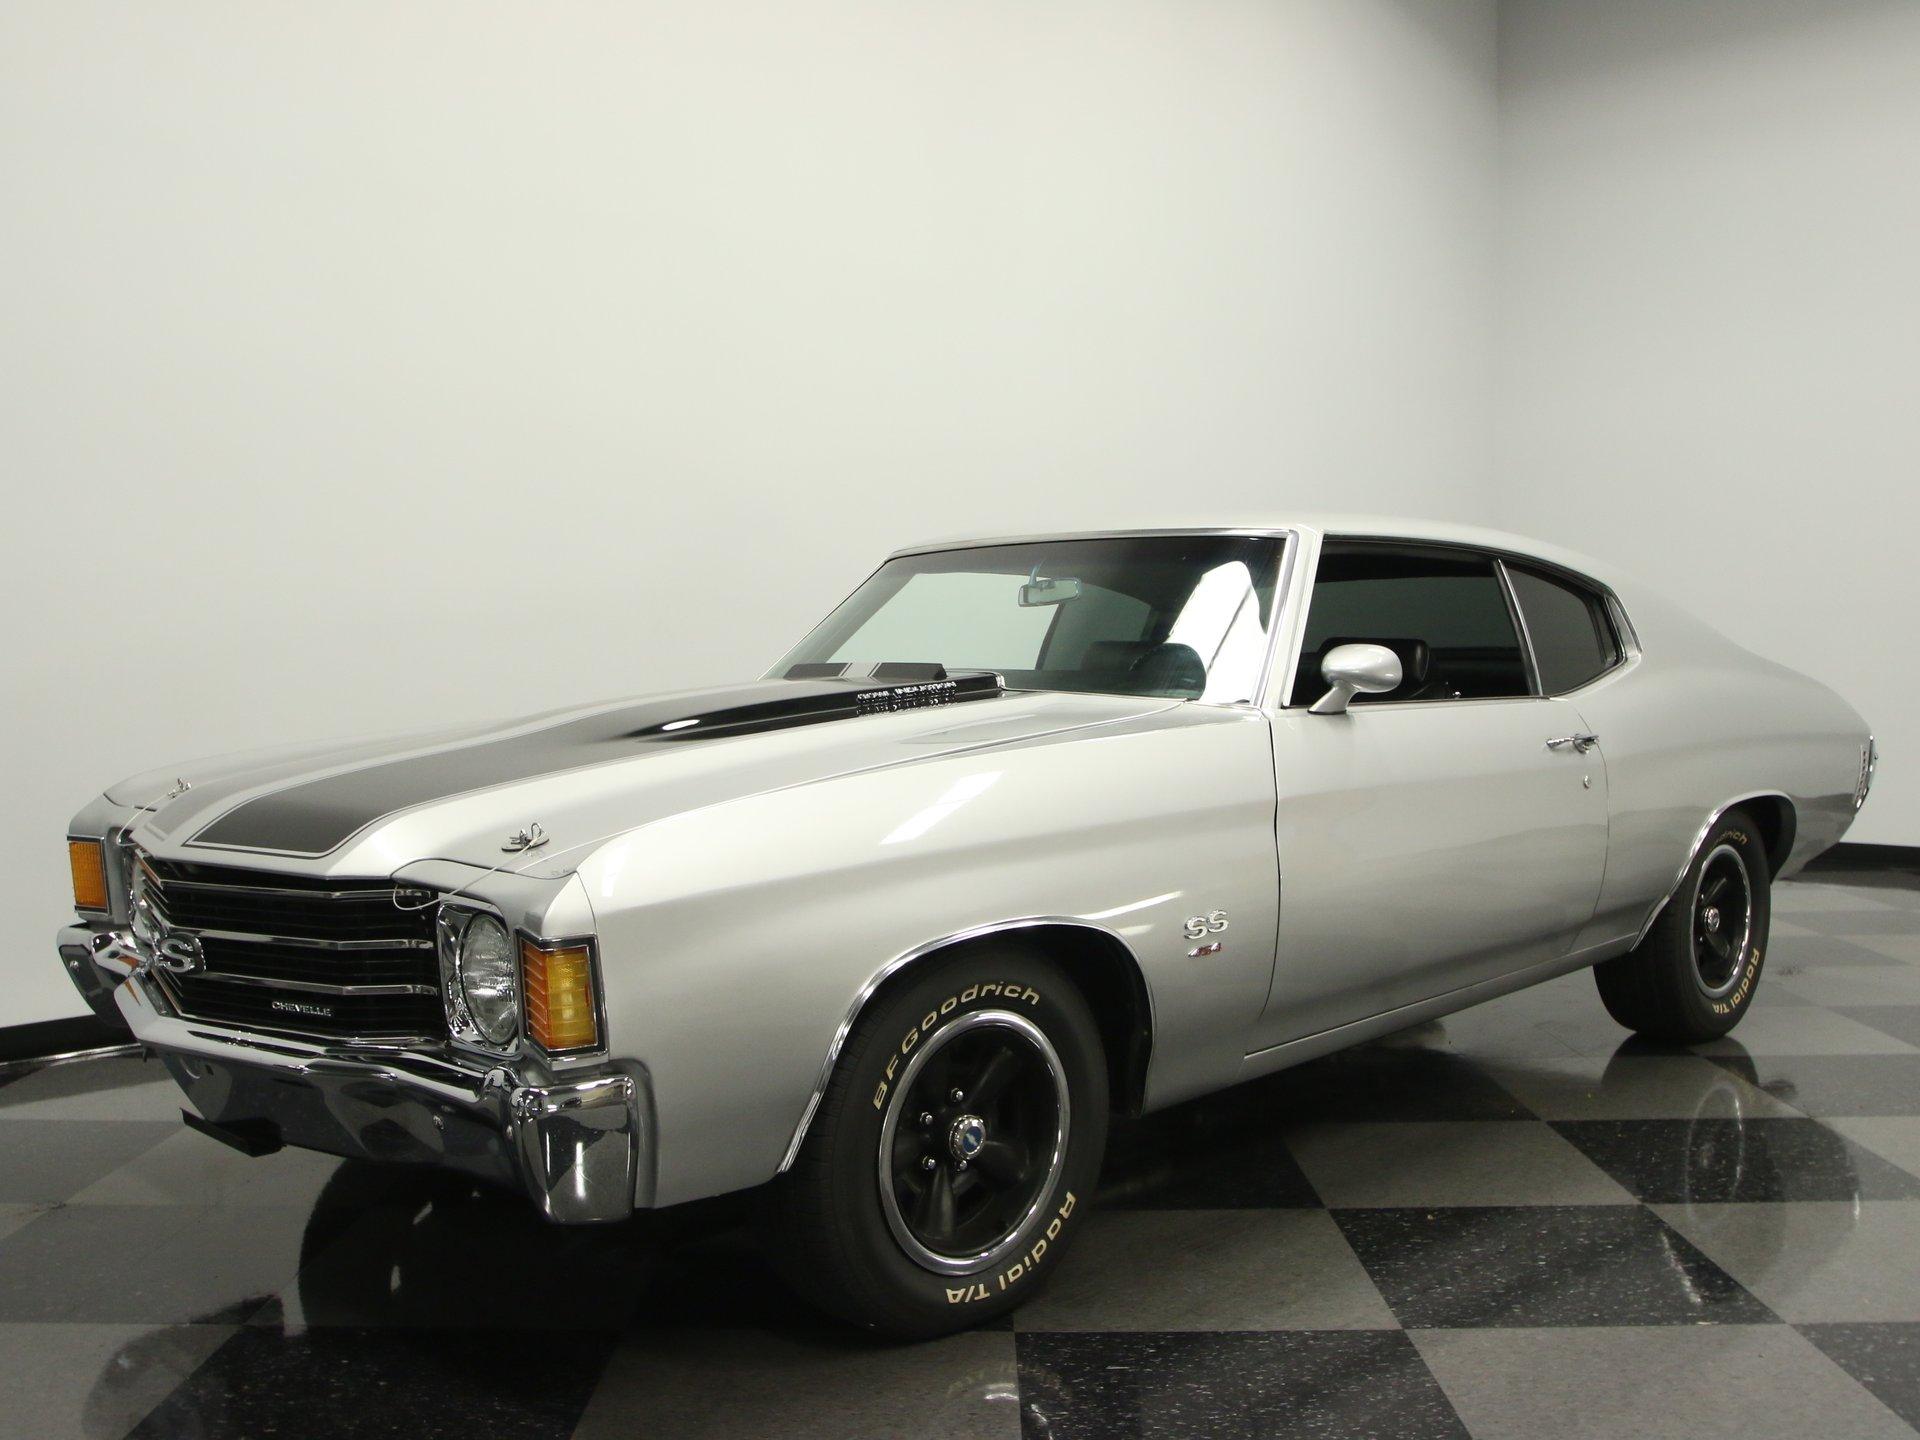 1972 chevrolet chevelle ss 454